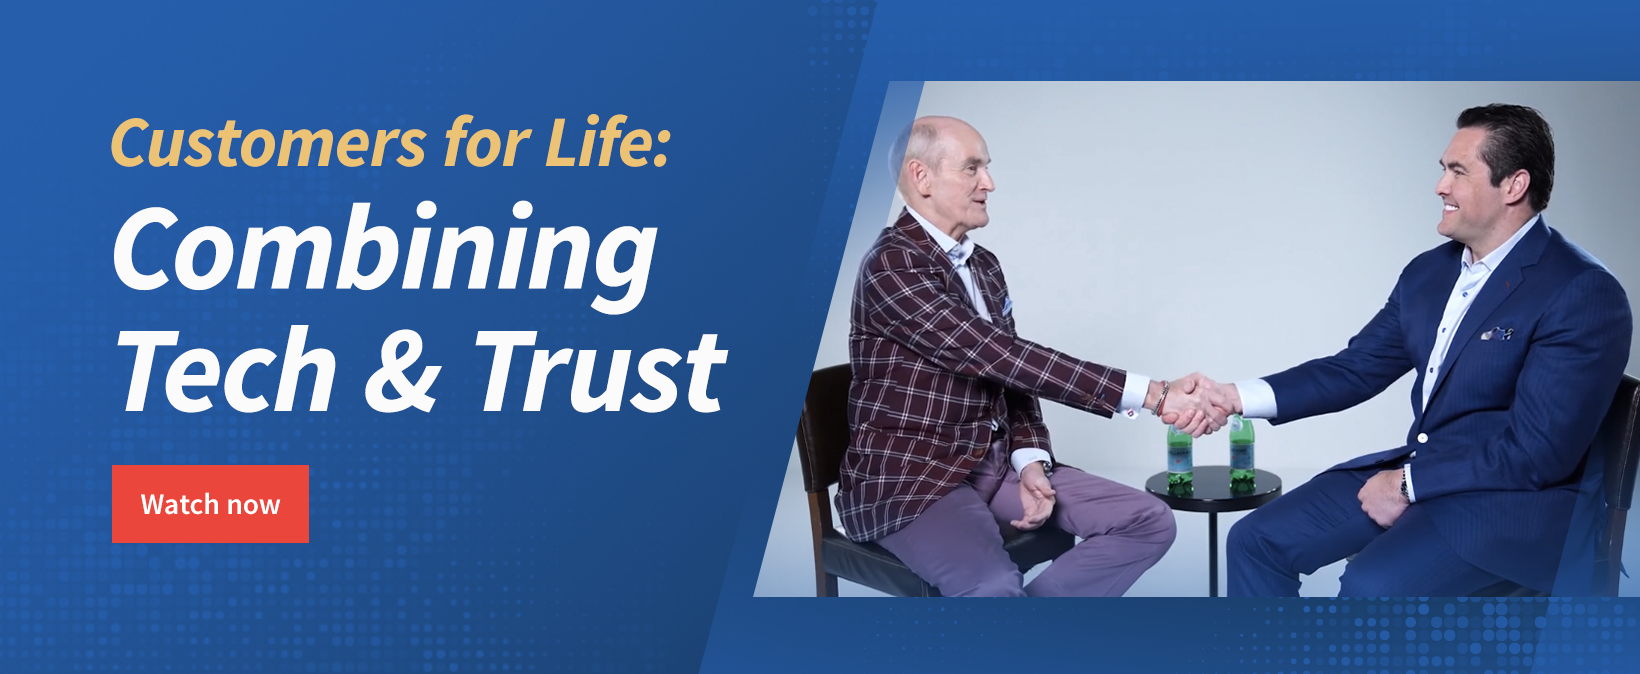 Todd Duncan: Combining Tech & Trust